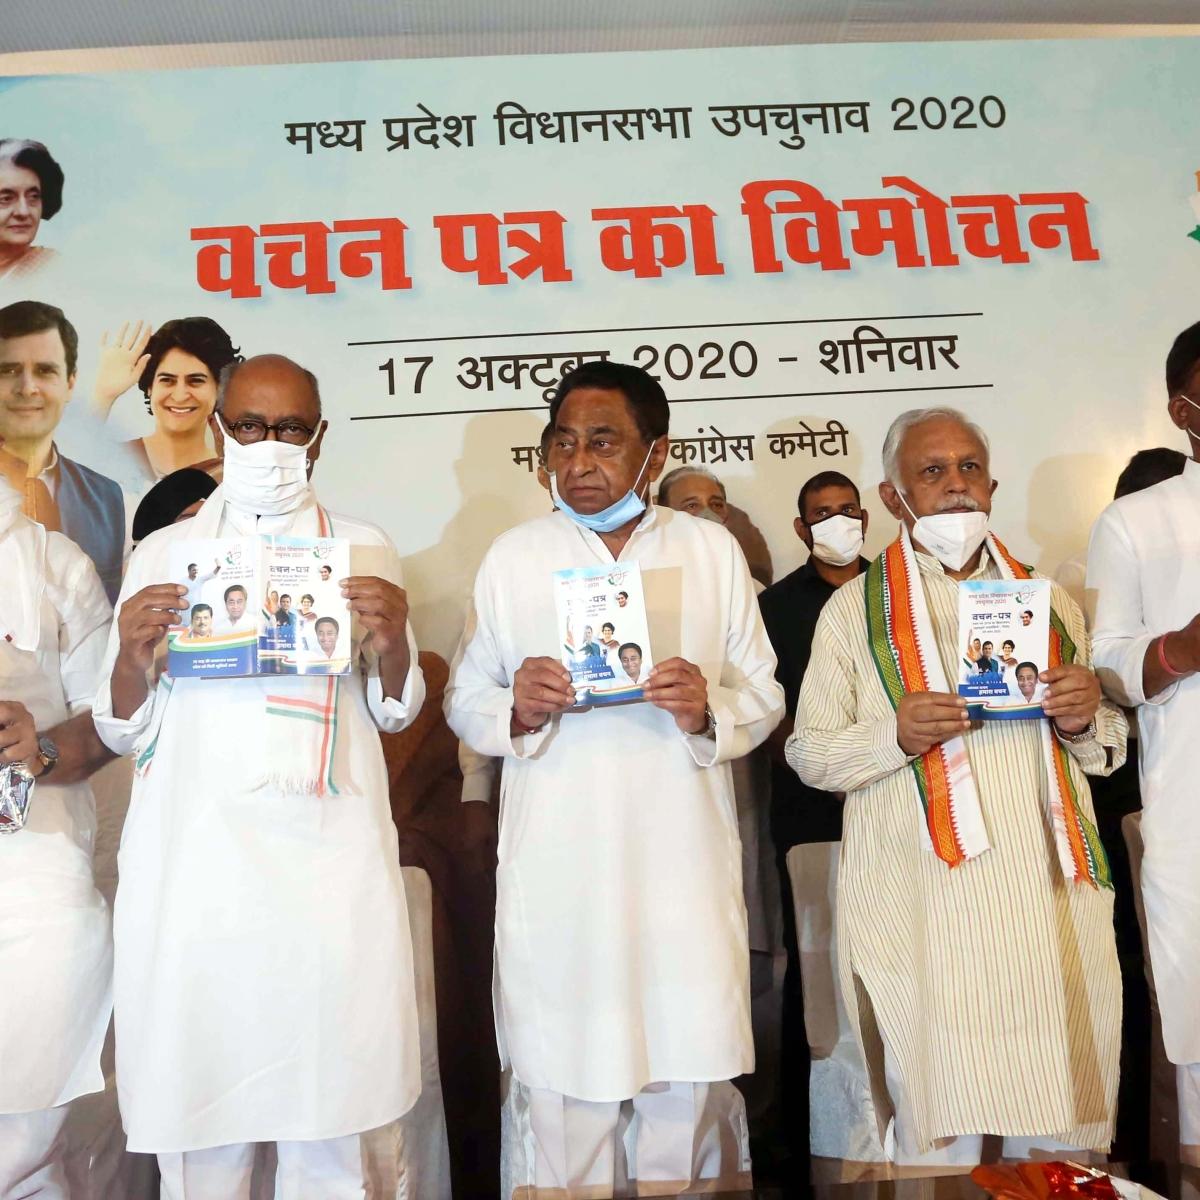 Madhya Pradesh Bypolls: Congress Vachan Patra for you